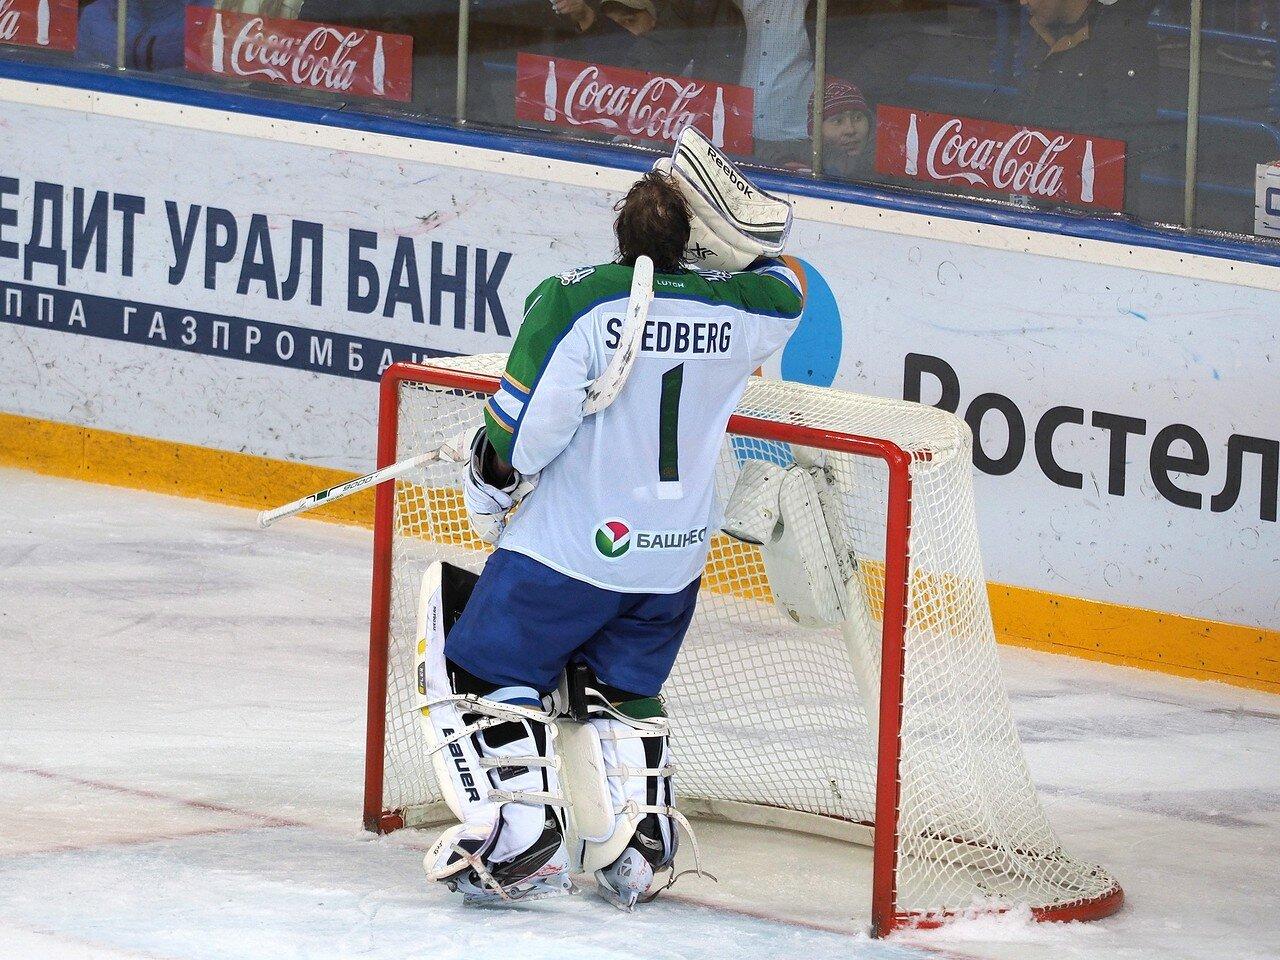 143Плей-офф 2016 Восток Финал Металлург - Салават Юлаев 23.03.2016